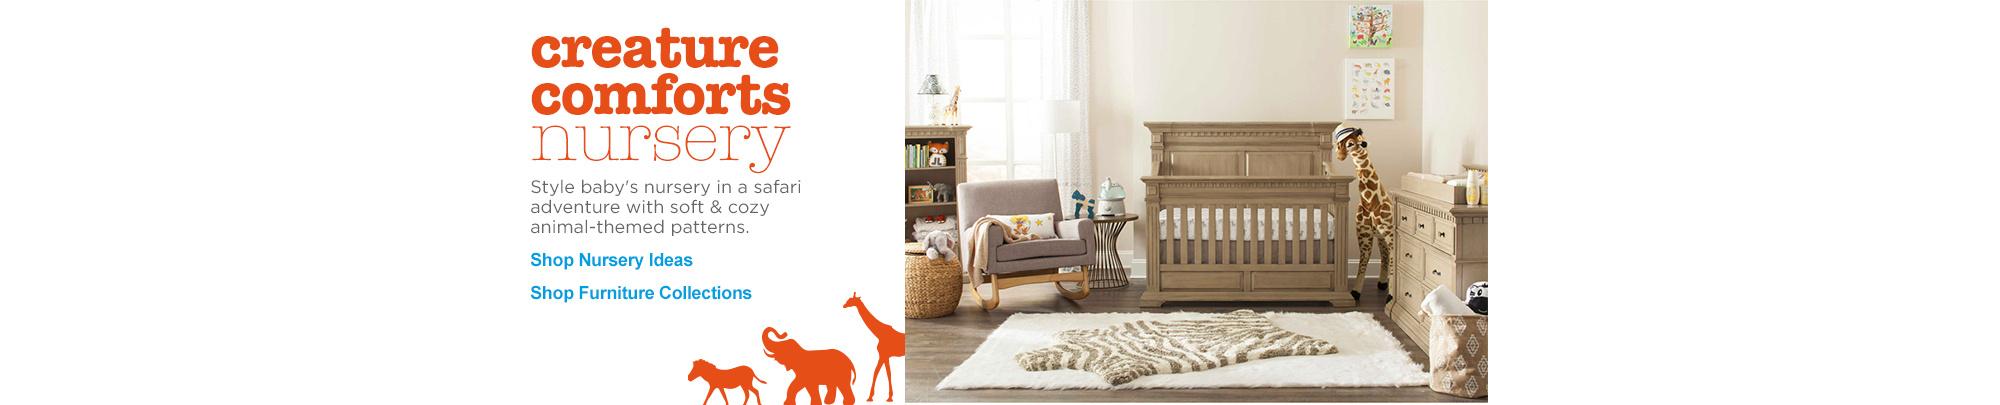 Baby cribs okc - Creature Comforts Nursery Shop Nursery Ideas